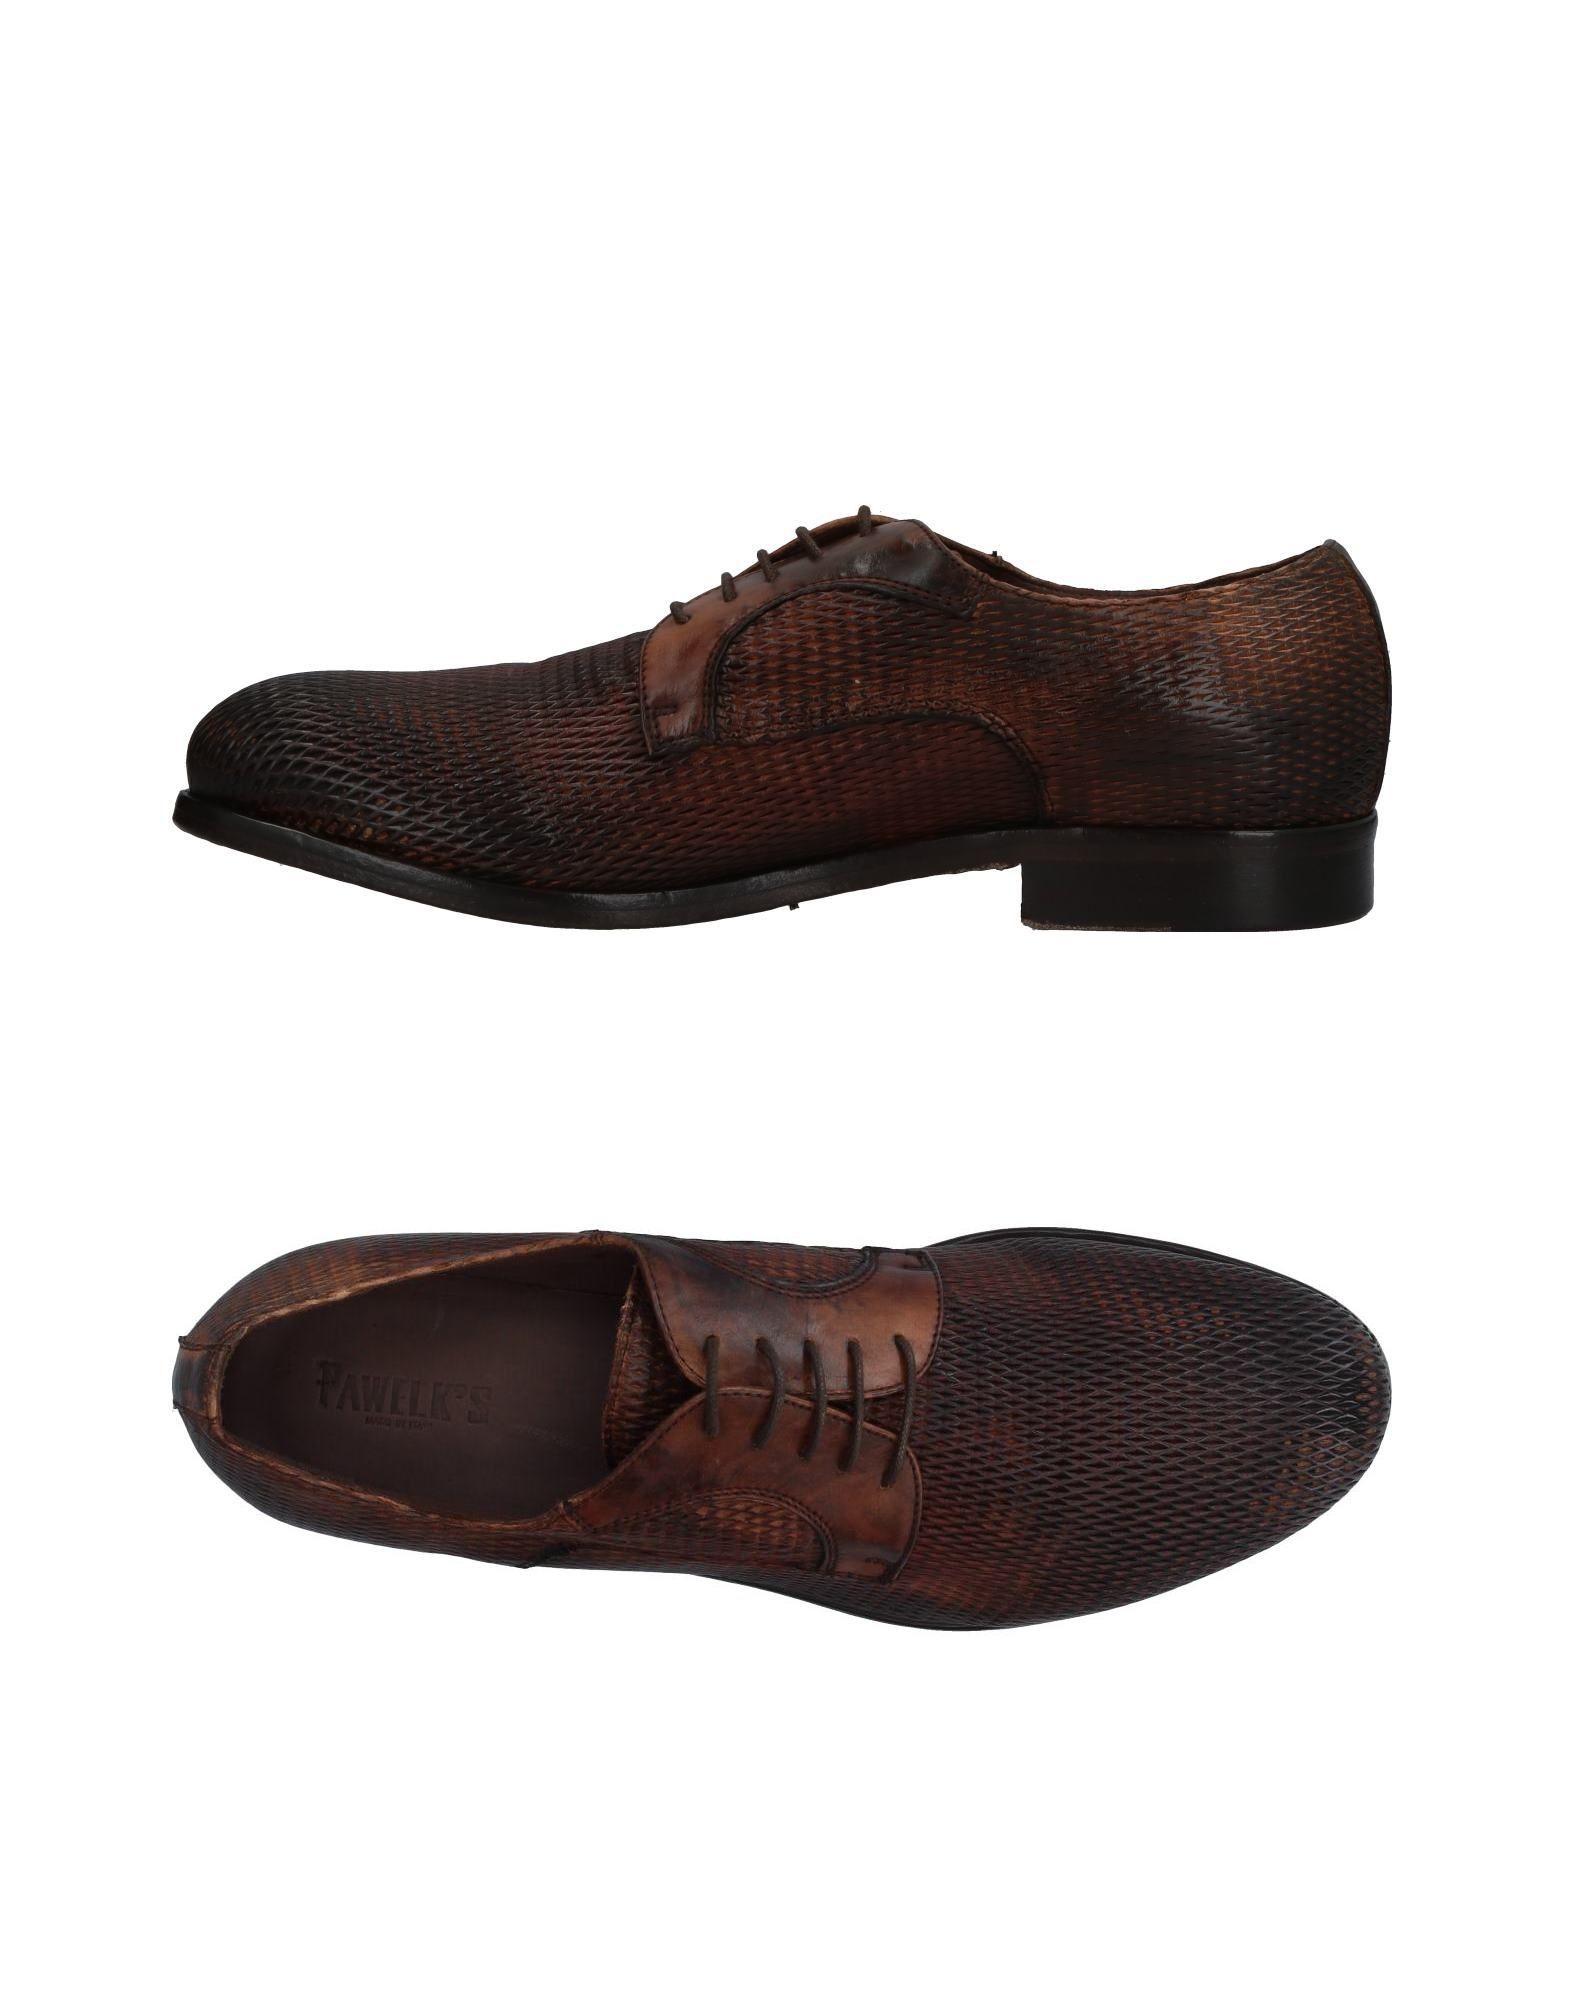 PAWELK'S Обувь на шнурках сандалии ия 2017 круглый нос летняя обувь кожаная обувь обувь с пряжечной кожаная обувь